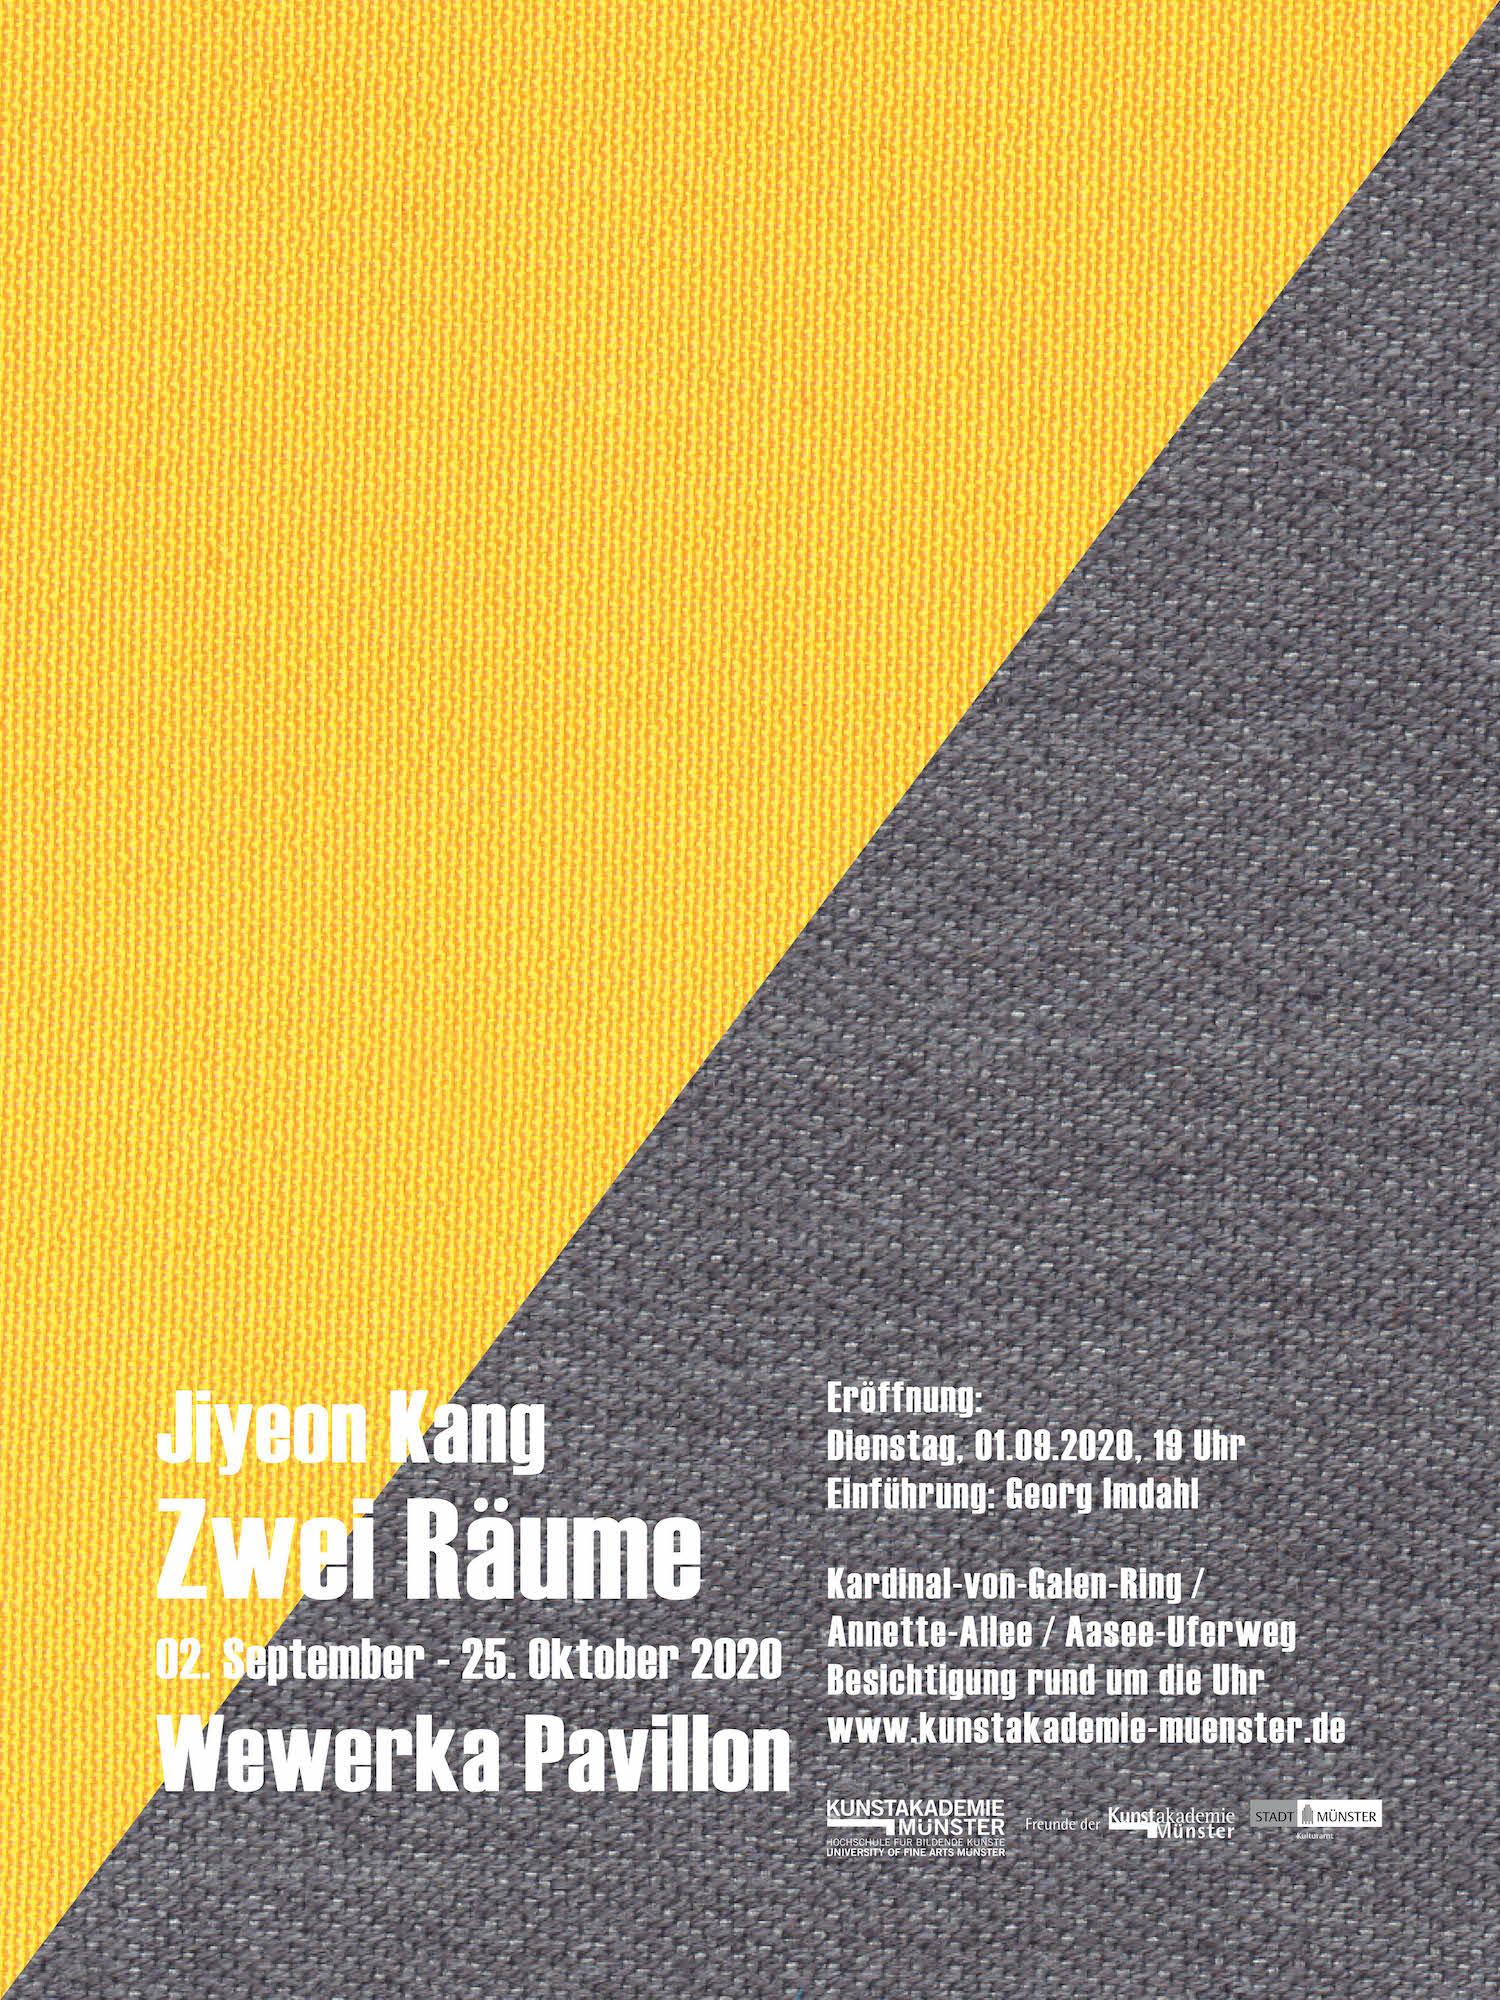 Eventbild für Wewerka Pavillon /// Zwei Räume /// Jiyeon Kang